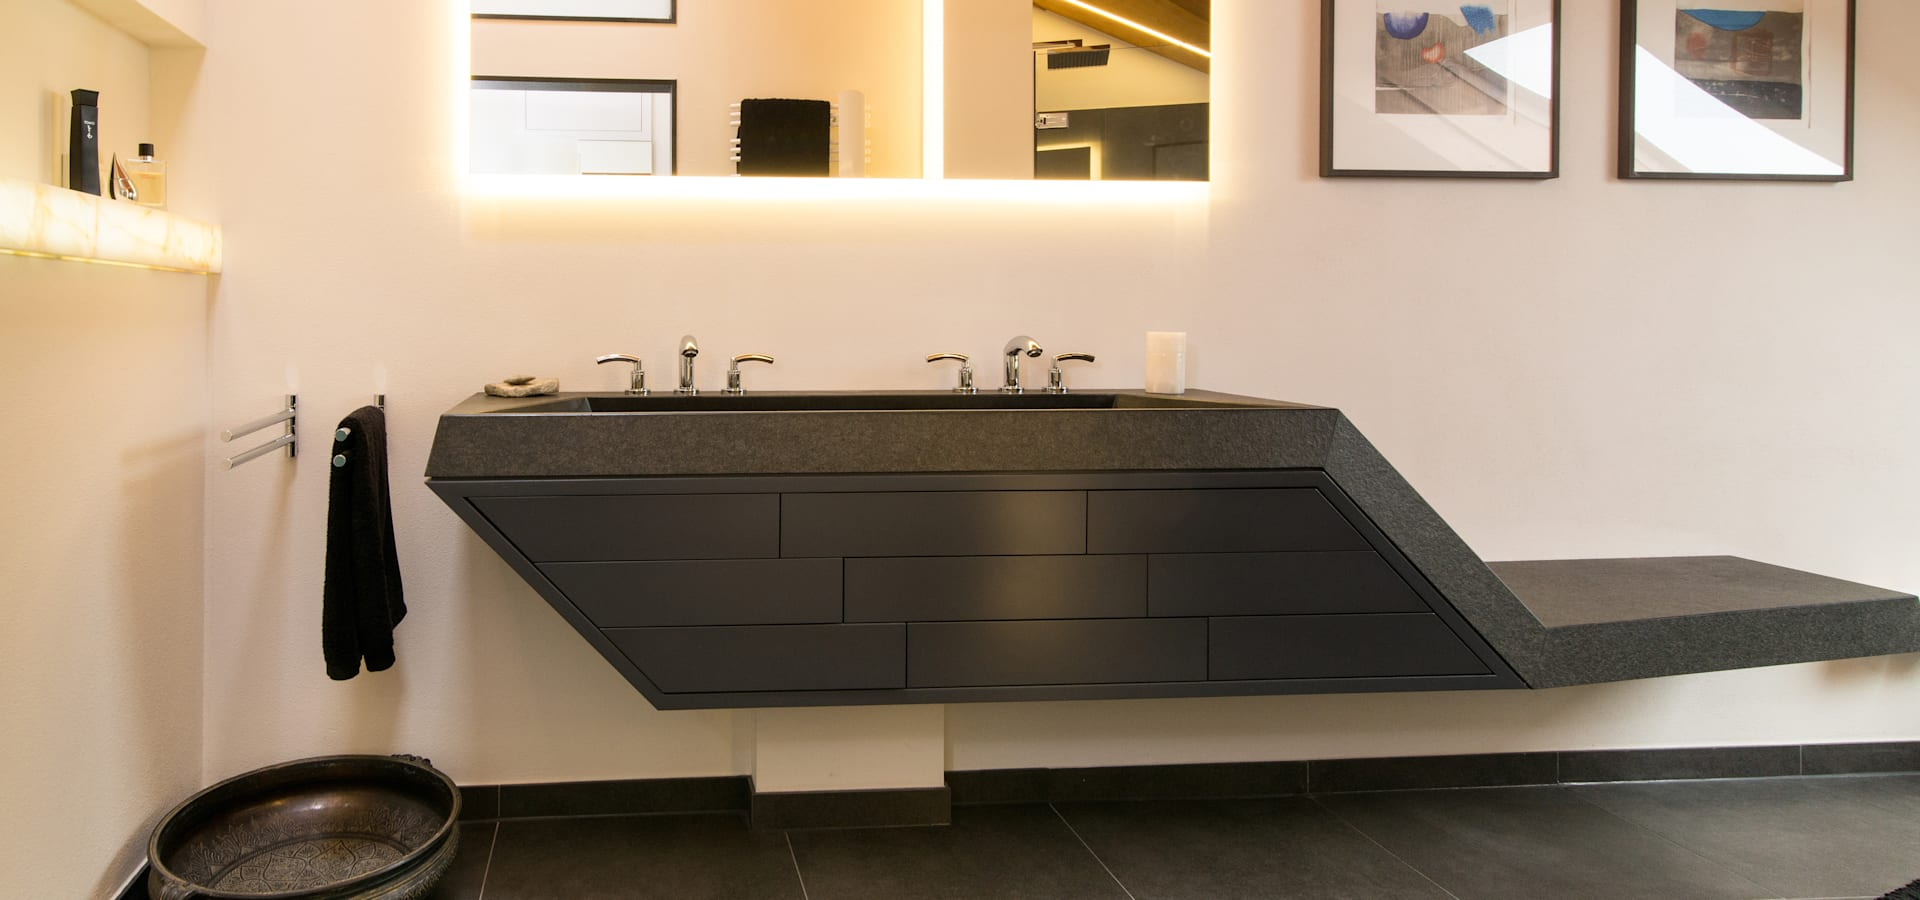 archiall2 interiordesign